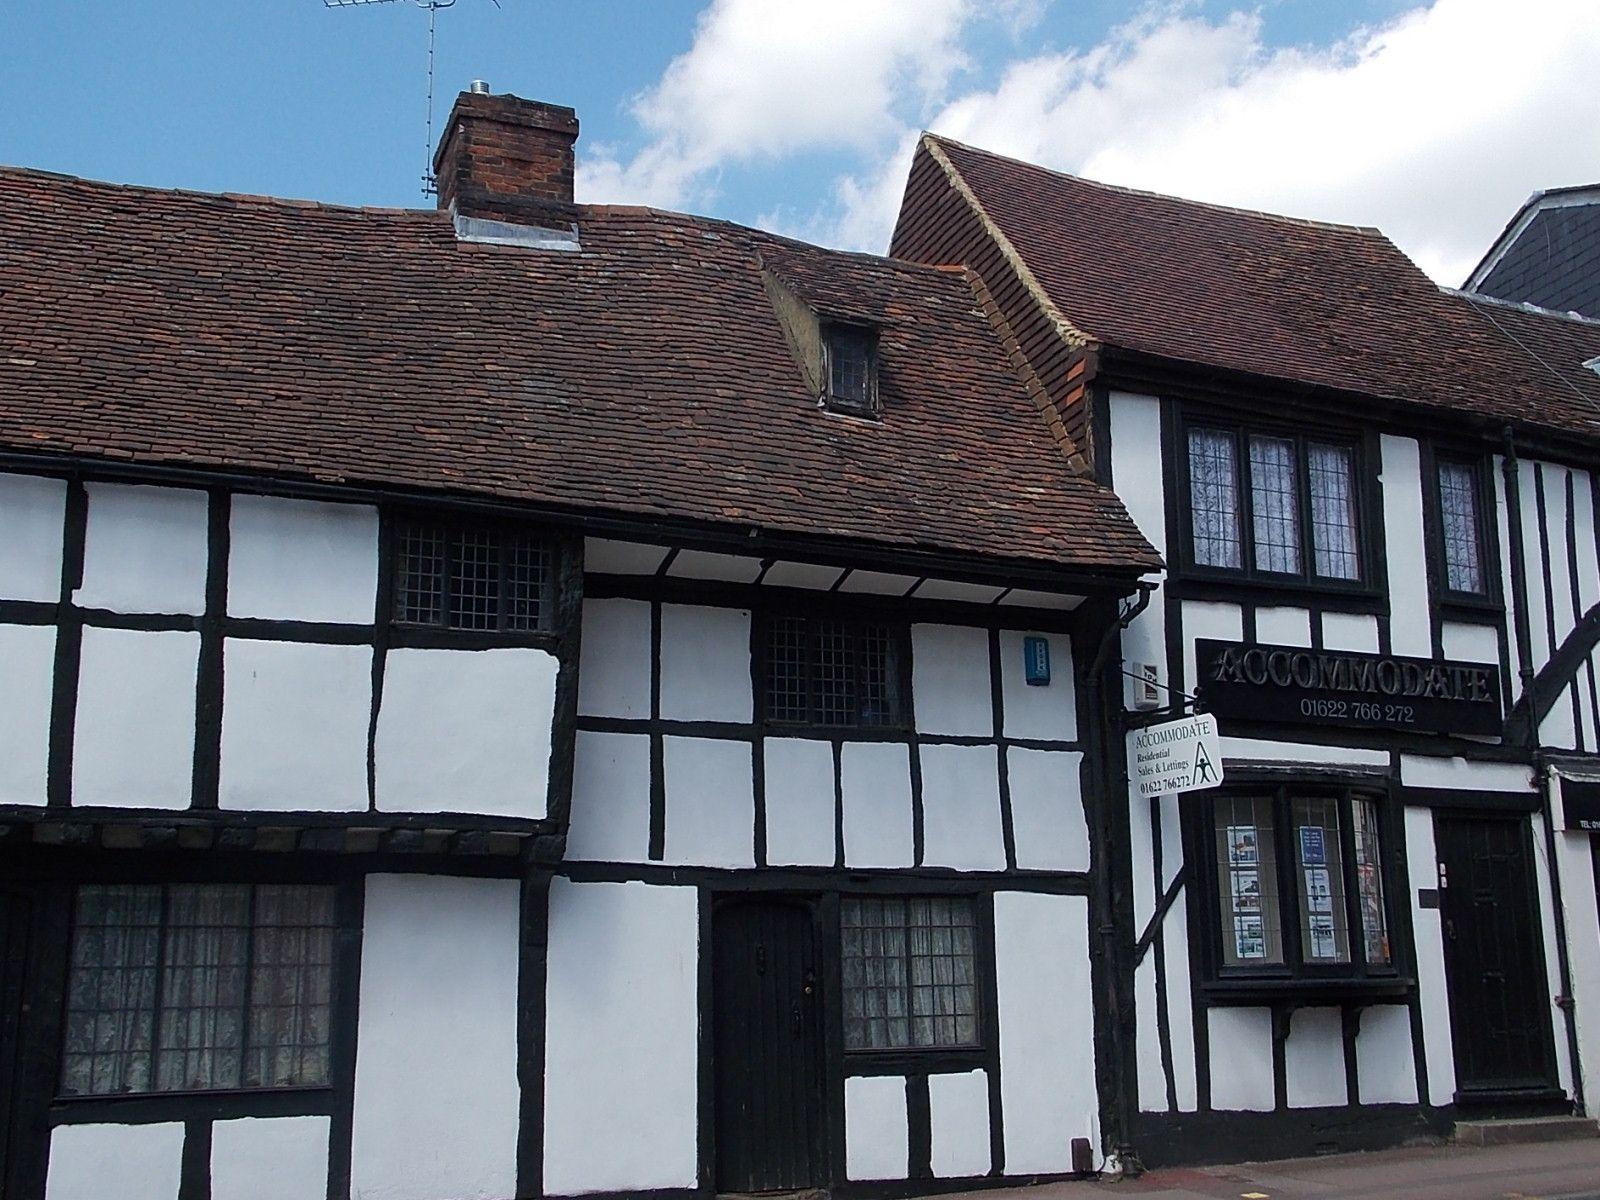 Medieval buildings in Maidstone, Kent, UK (photo by me)